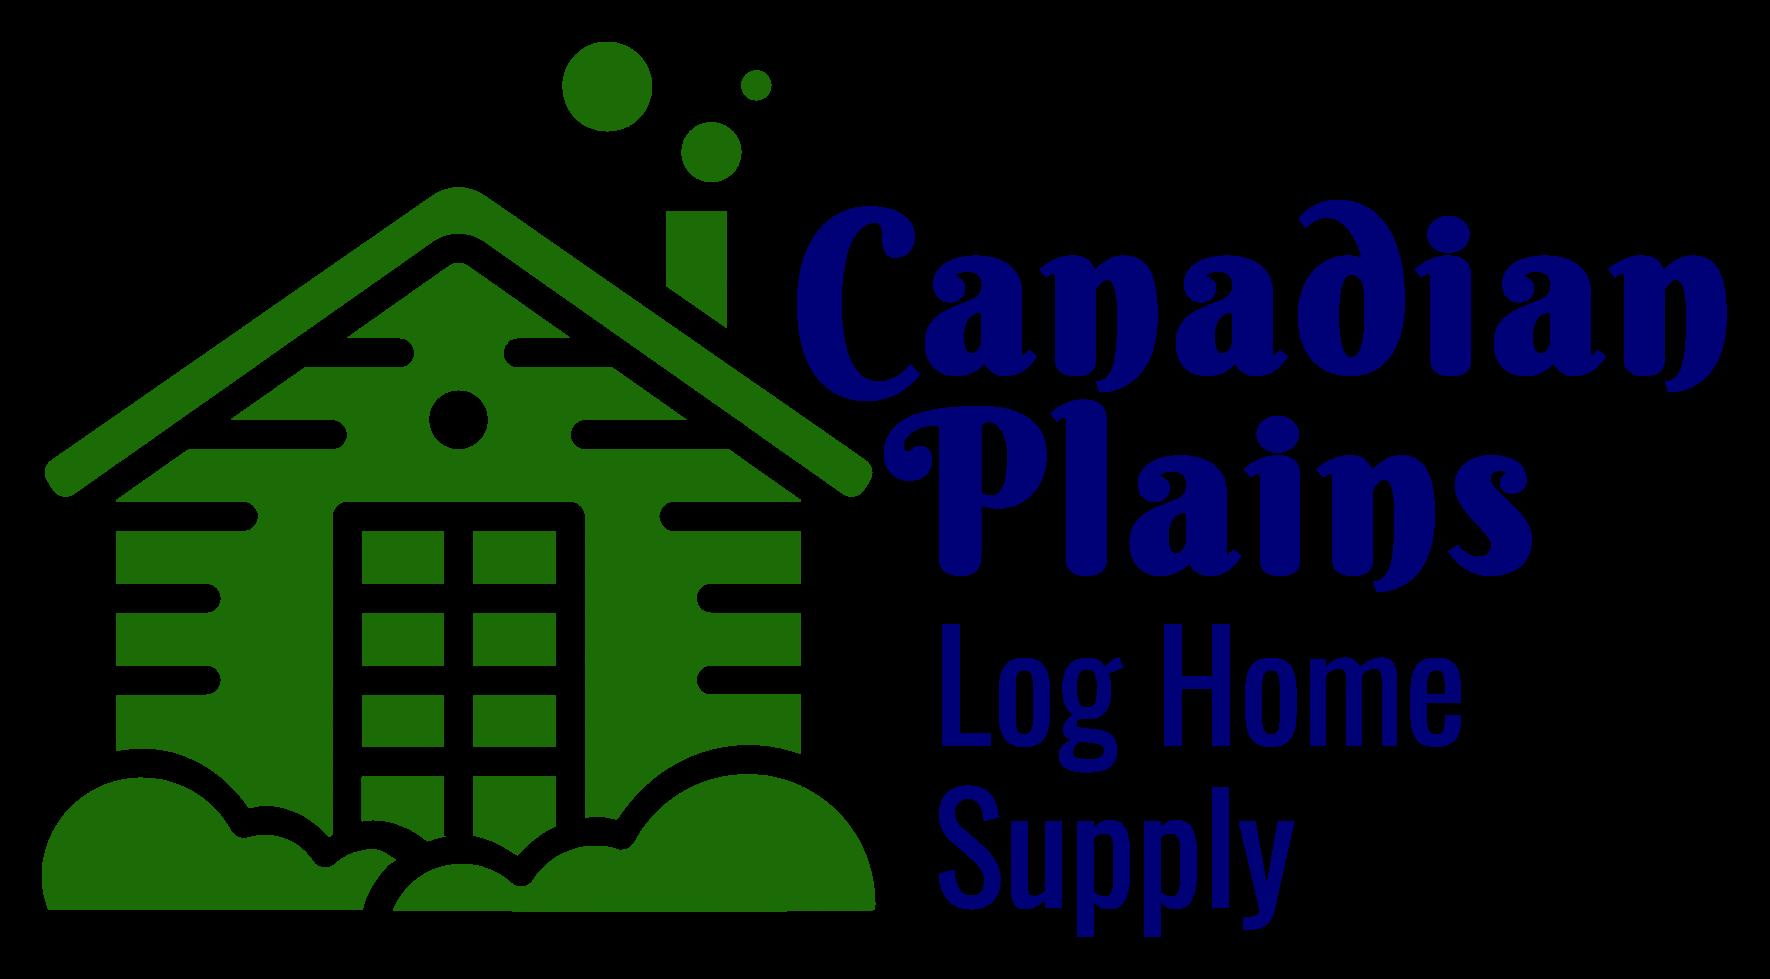 Canadian Plains Log Home Supply